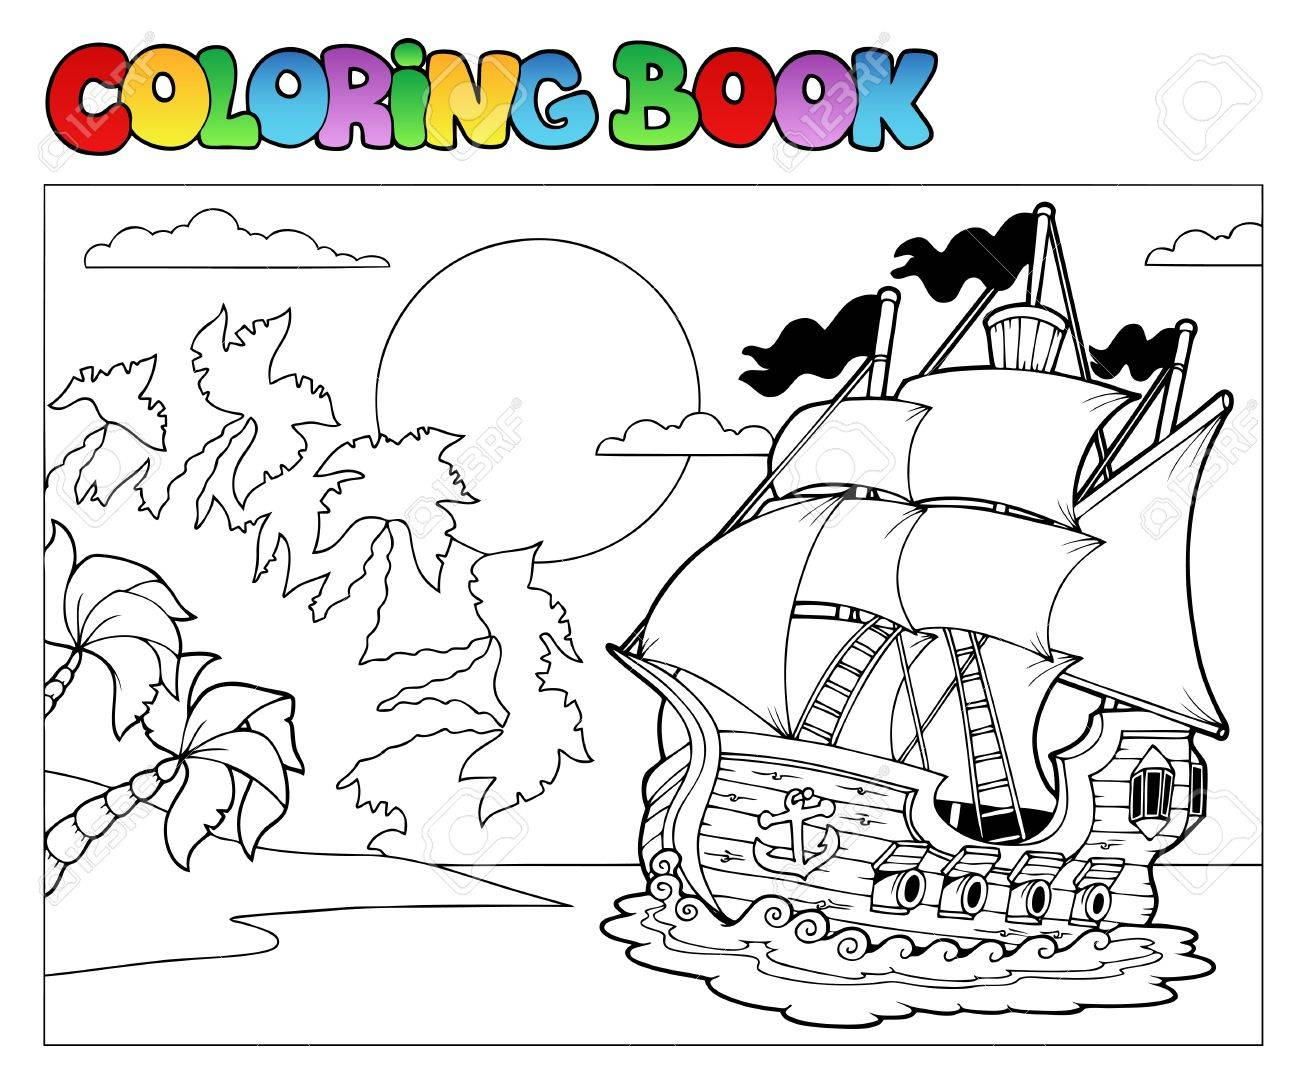 Libro Para Colorear Con Escena De Pirata 2 - Ilustración Vectorial ...